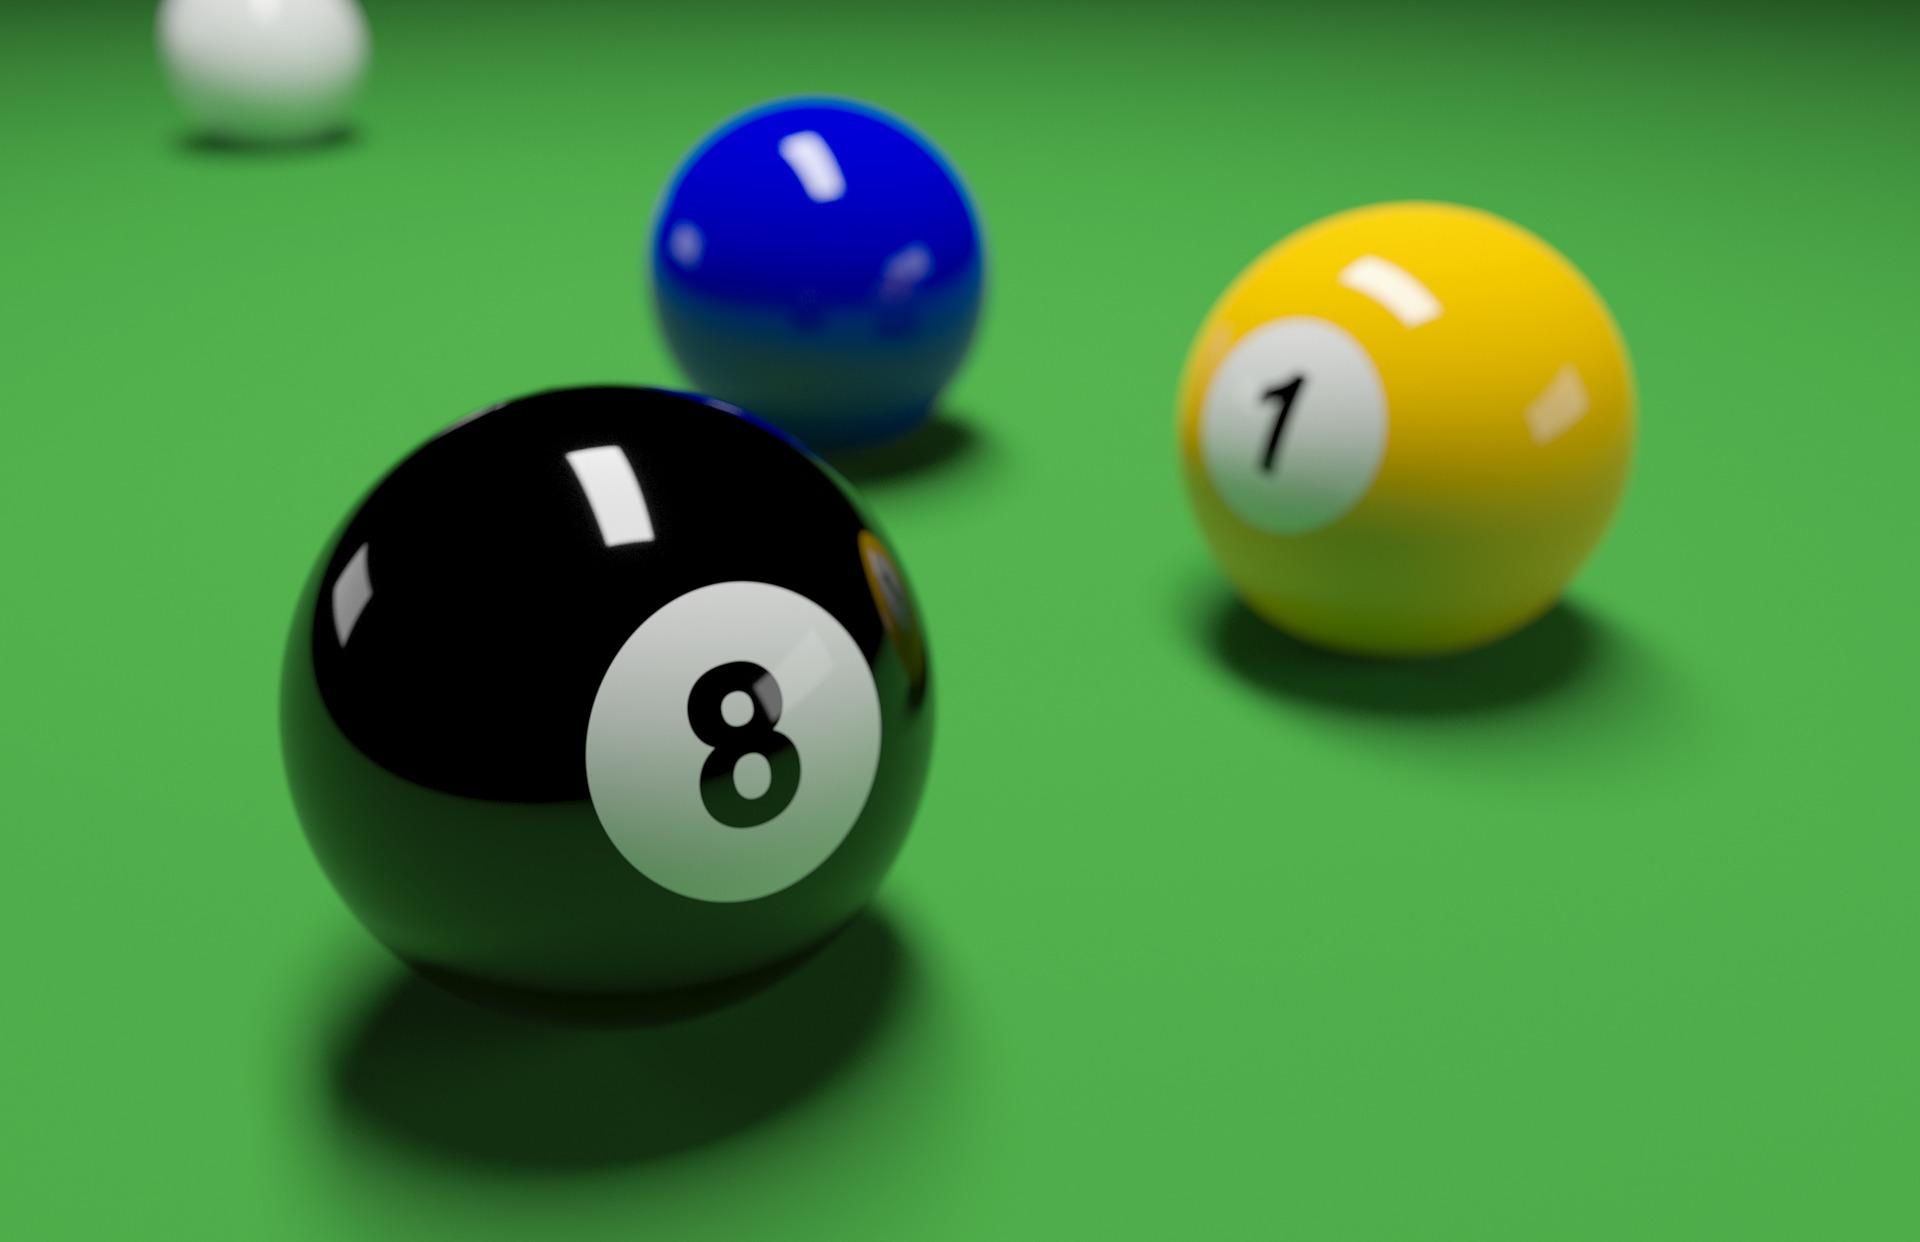 eight-ball-3721944_1920